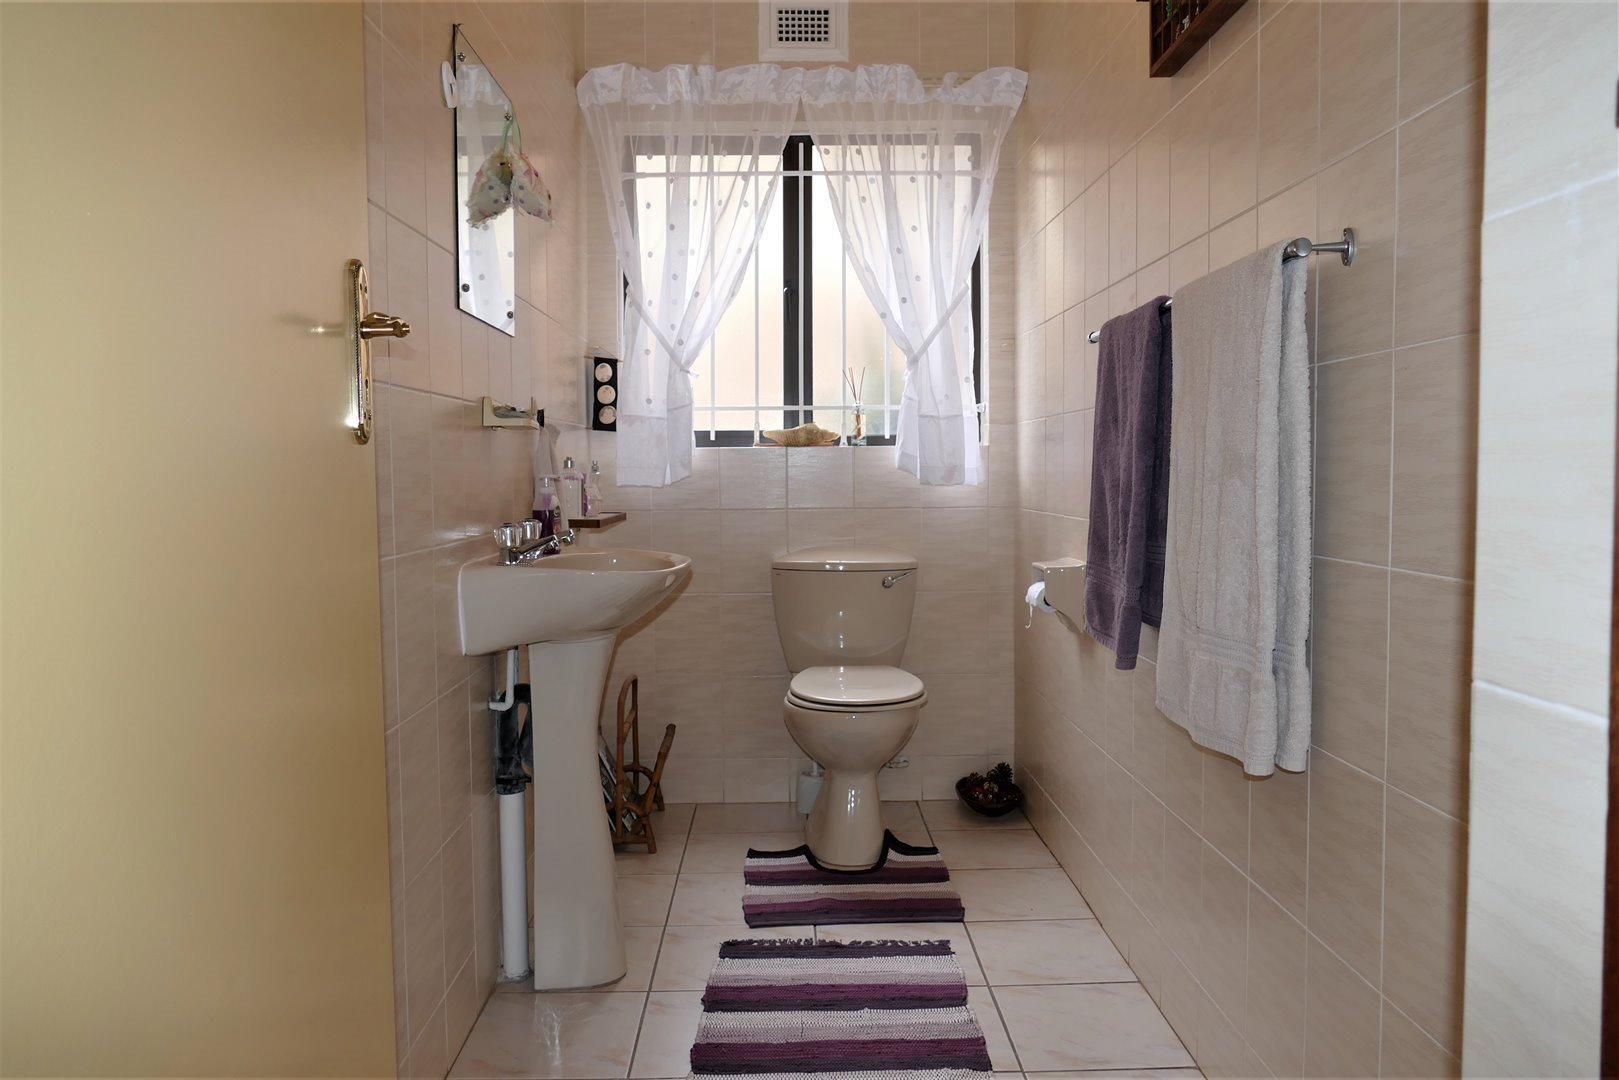 Scottburgh Central property for sale. Ref No: 13520880. Picture no 23